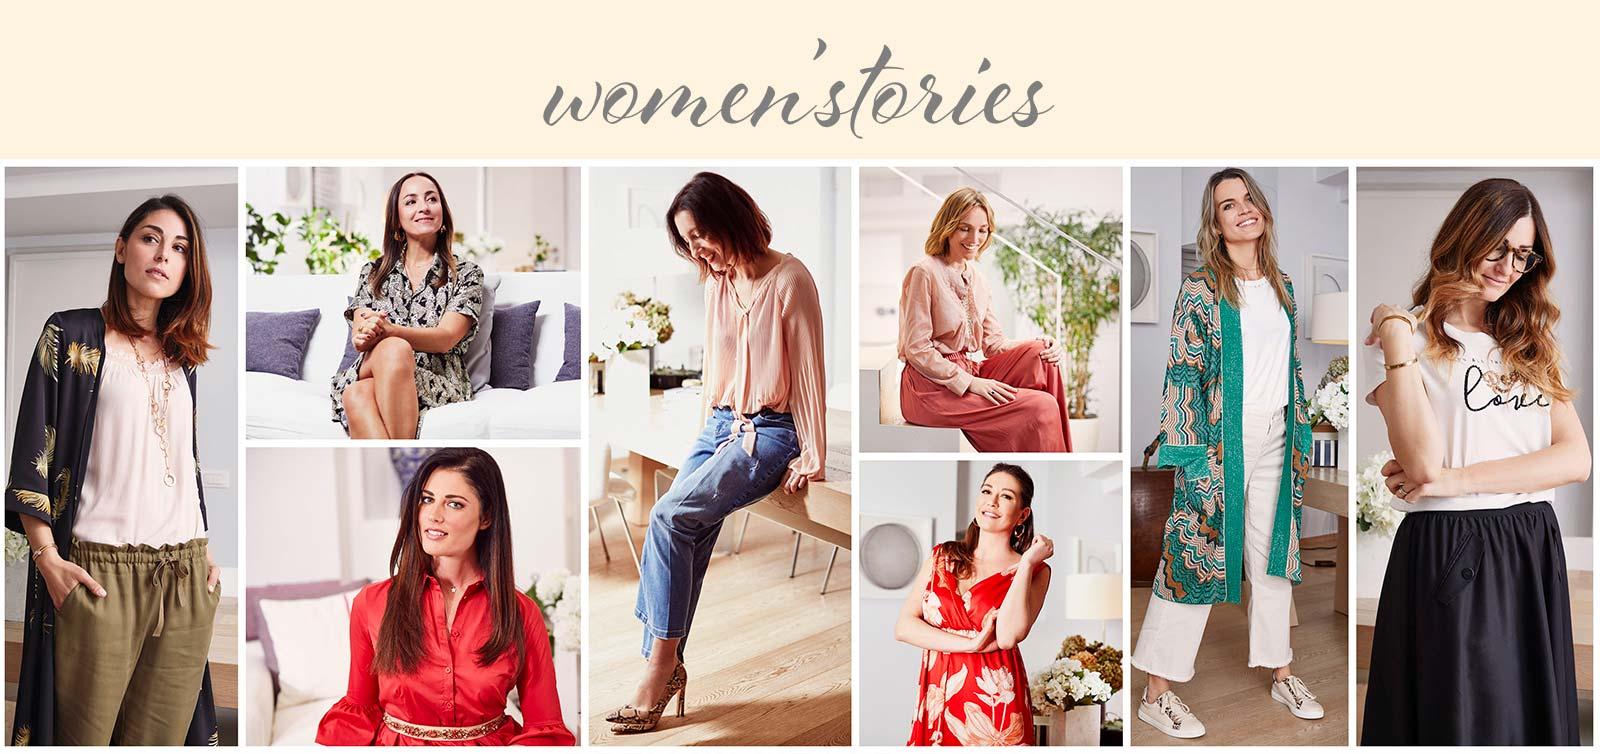 OLTRE: WOMEN'STORIES